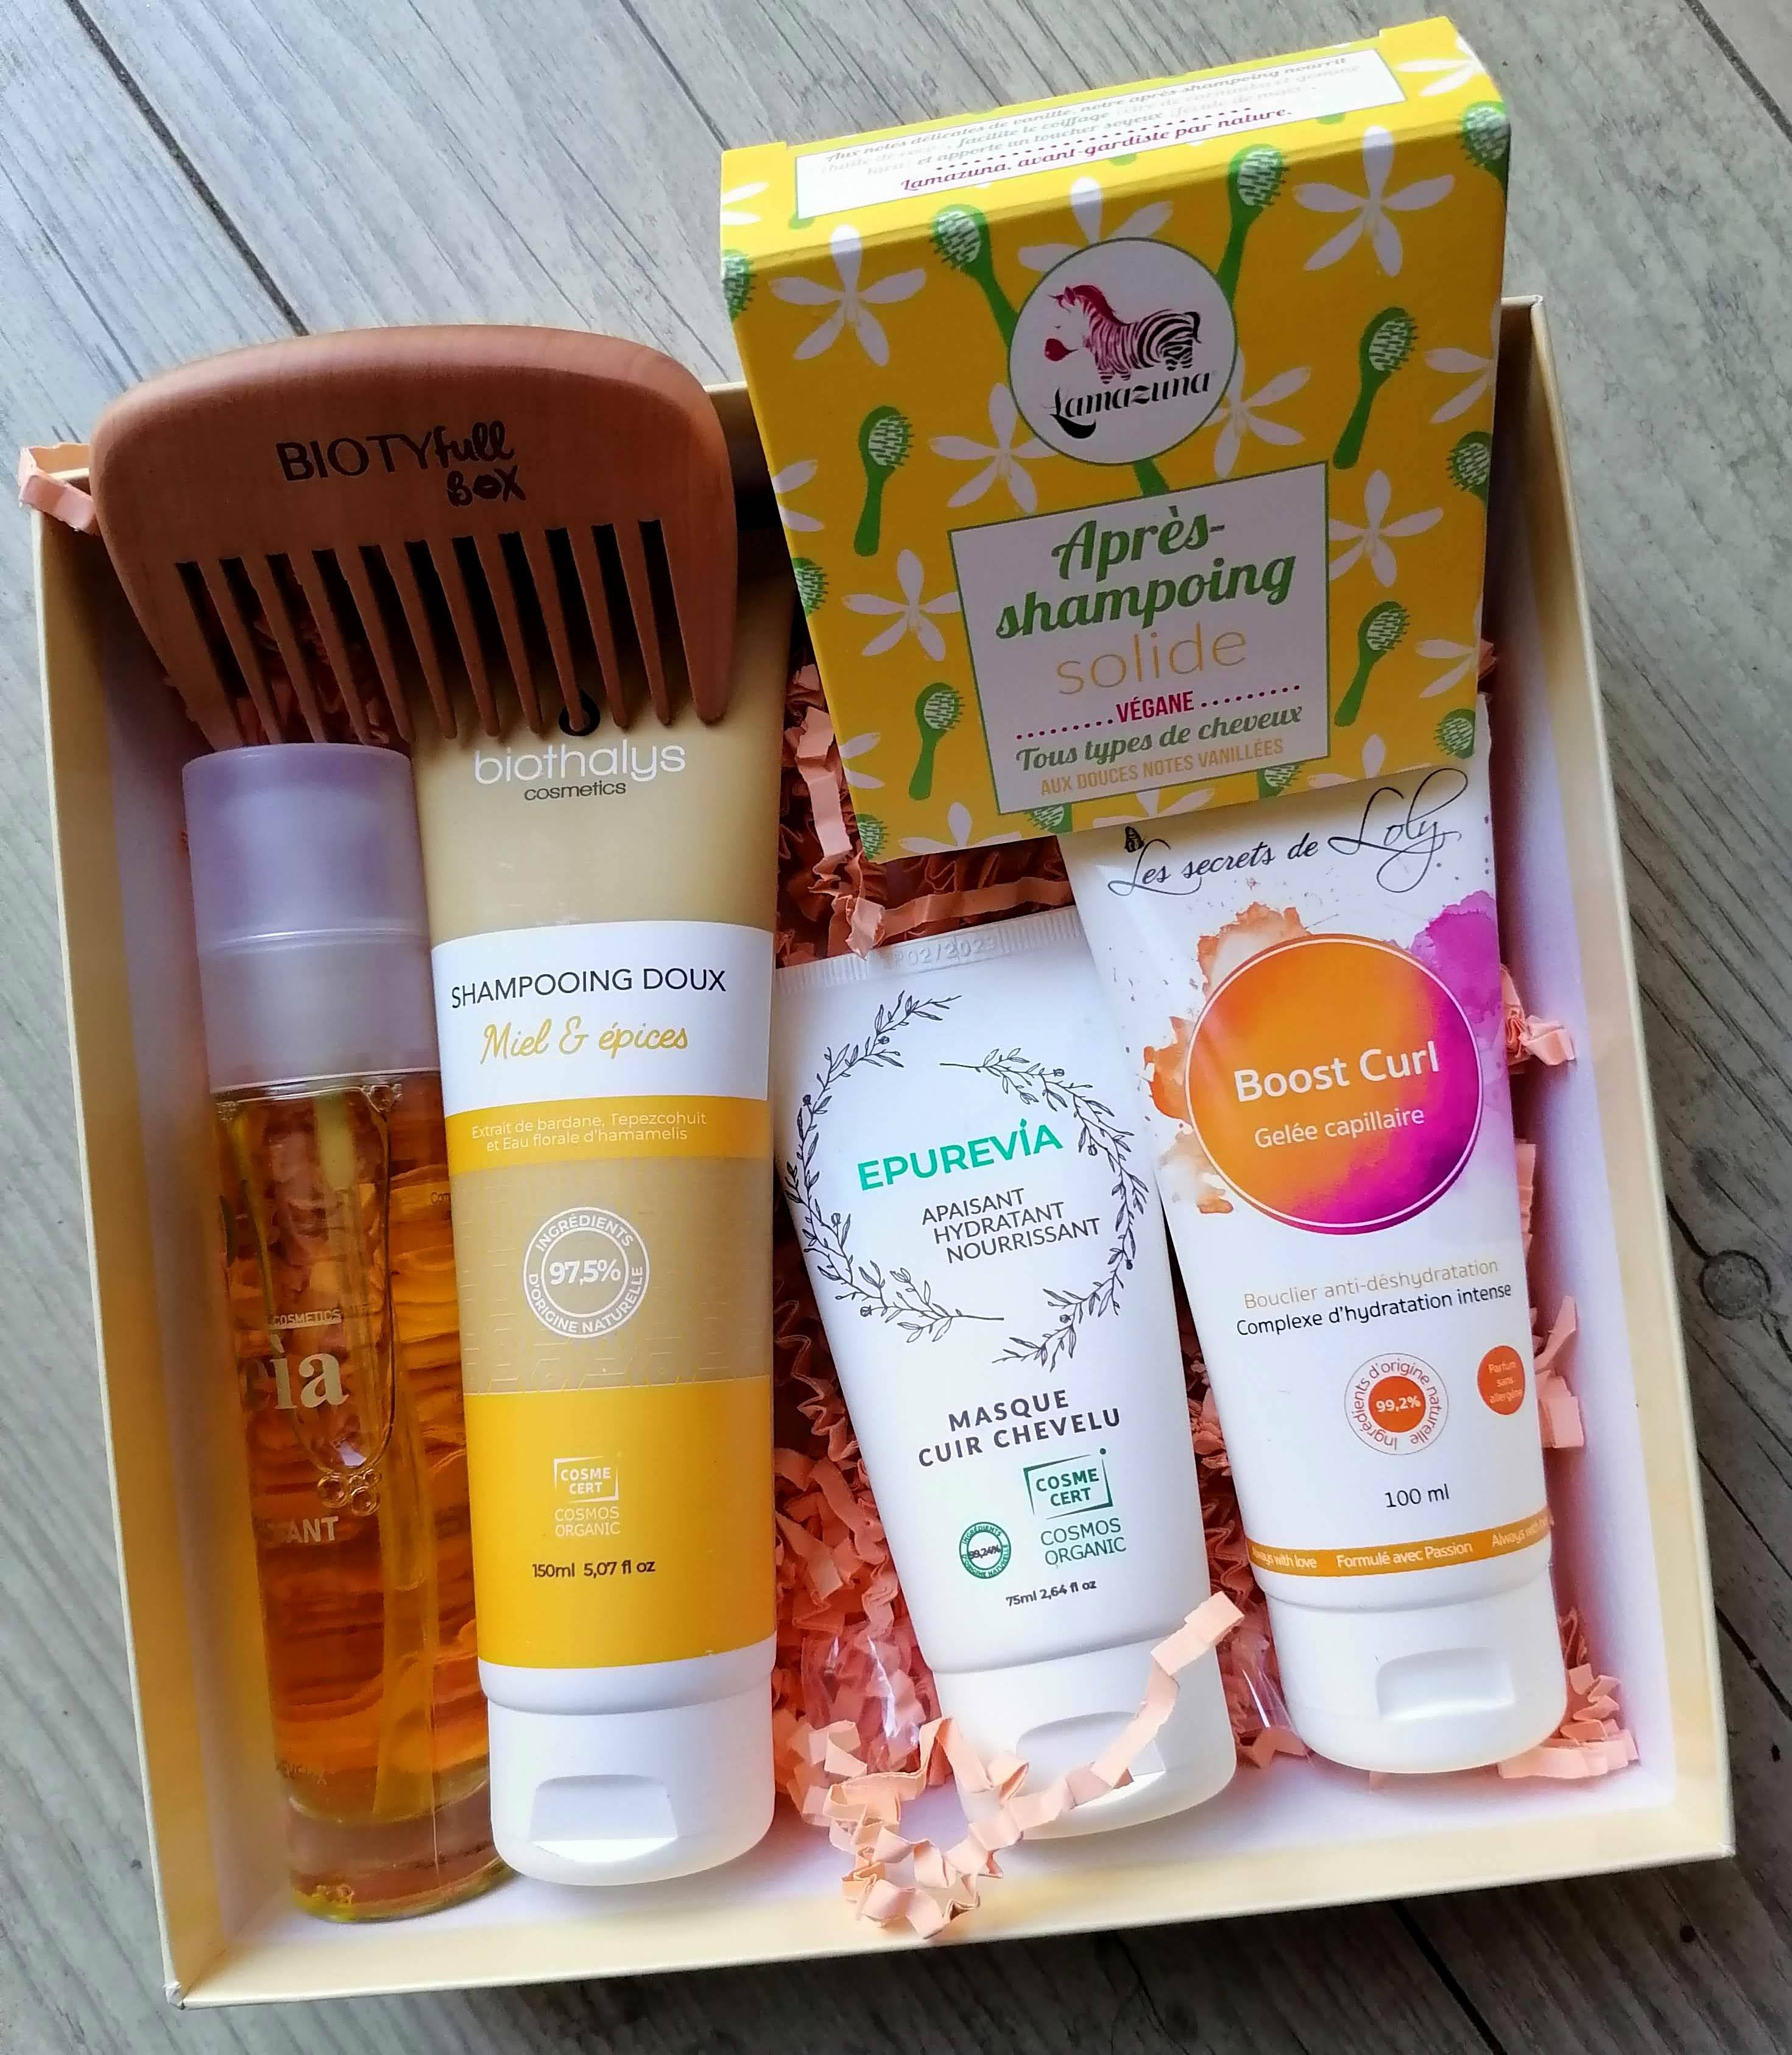 BIOTYFULL BOX Avril 2020 : L'éblouissante 100% cheveux!